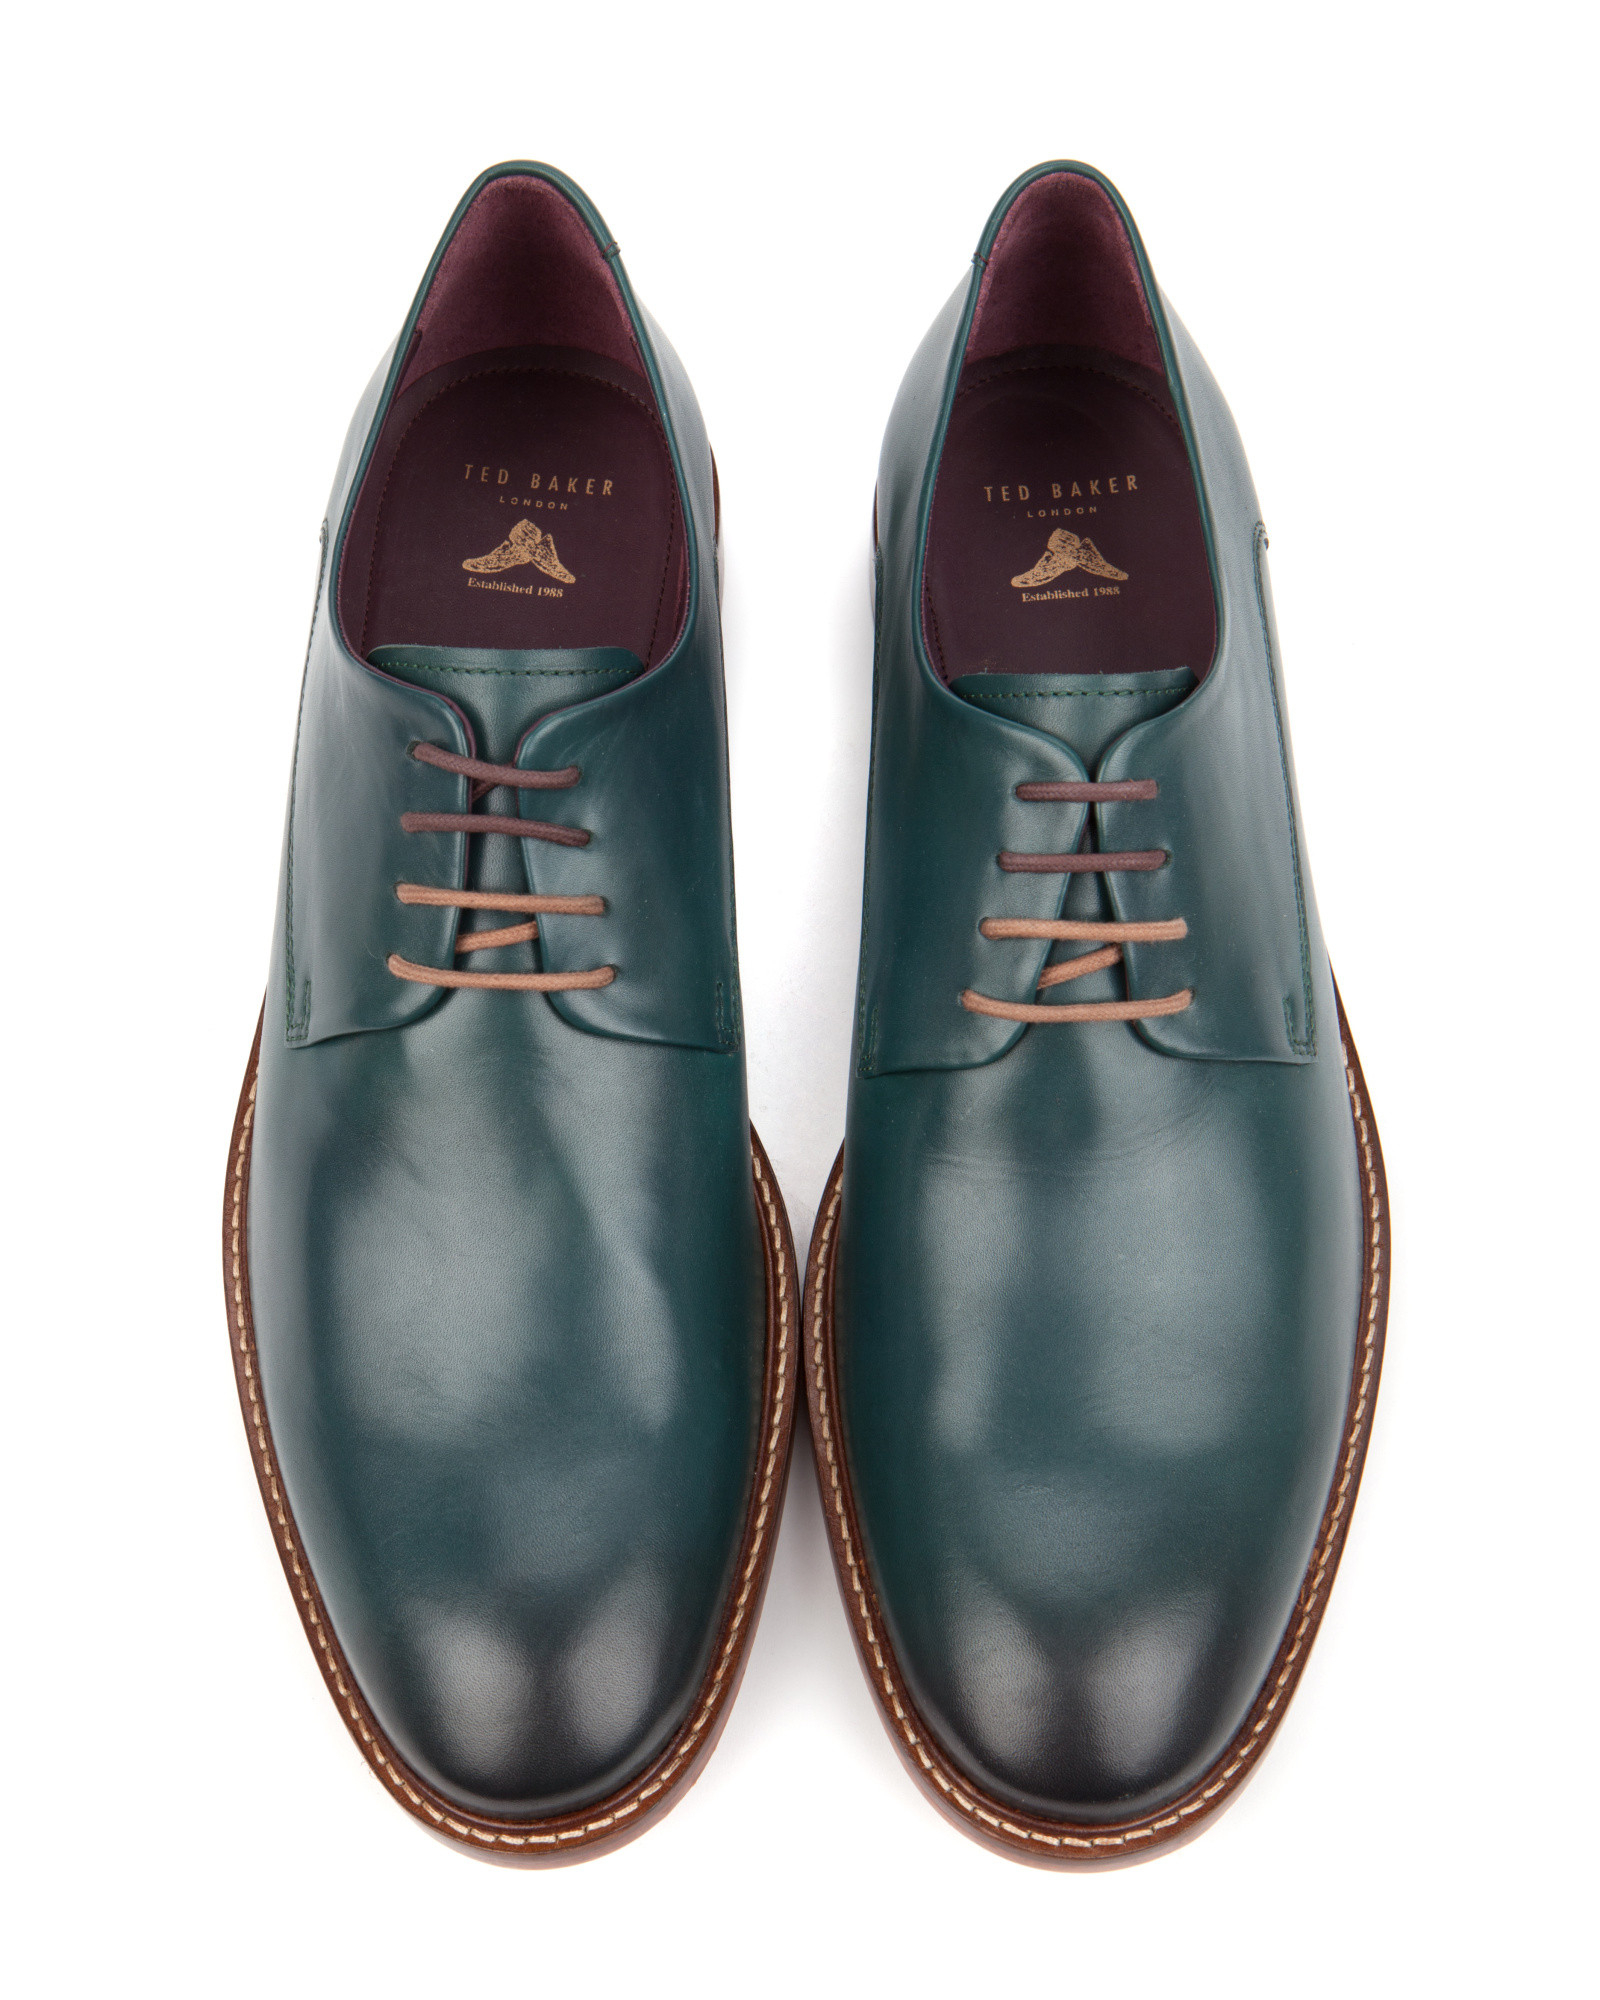 91083b5b13e438 ... Derby Brogues Brown Shoes Baker Mens Ted R7e5364 FILMVWXZ15. Gallery